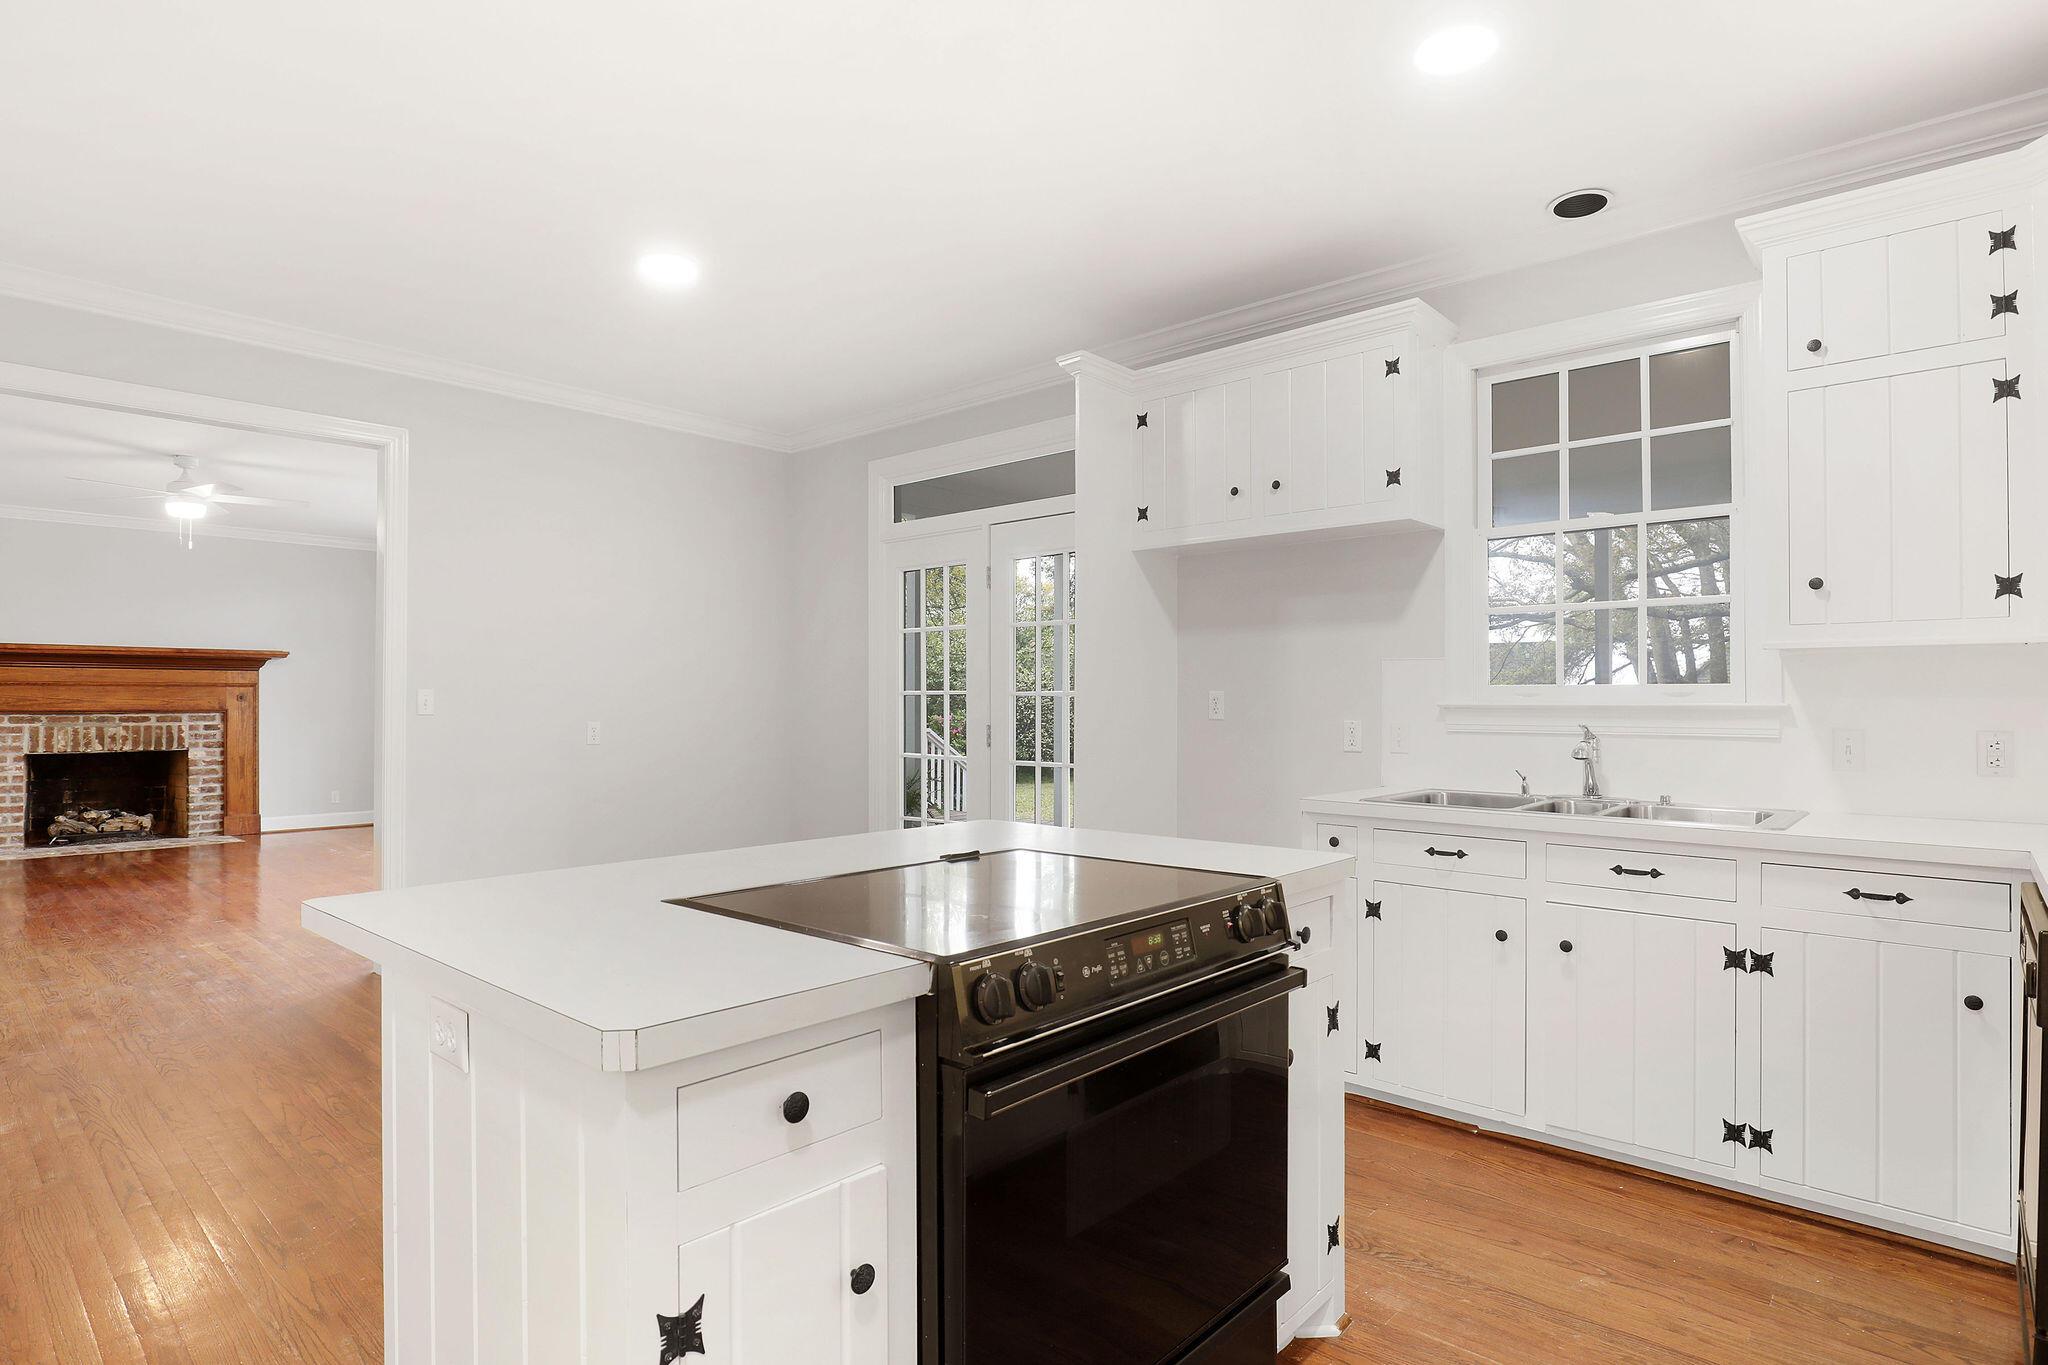 Old Mt Pleasant Homes For Sale - 1417 Edwards, Mount Pleasant, SC - 34